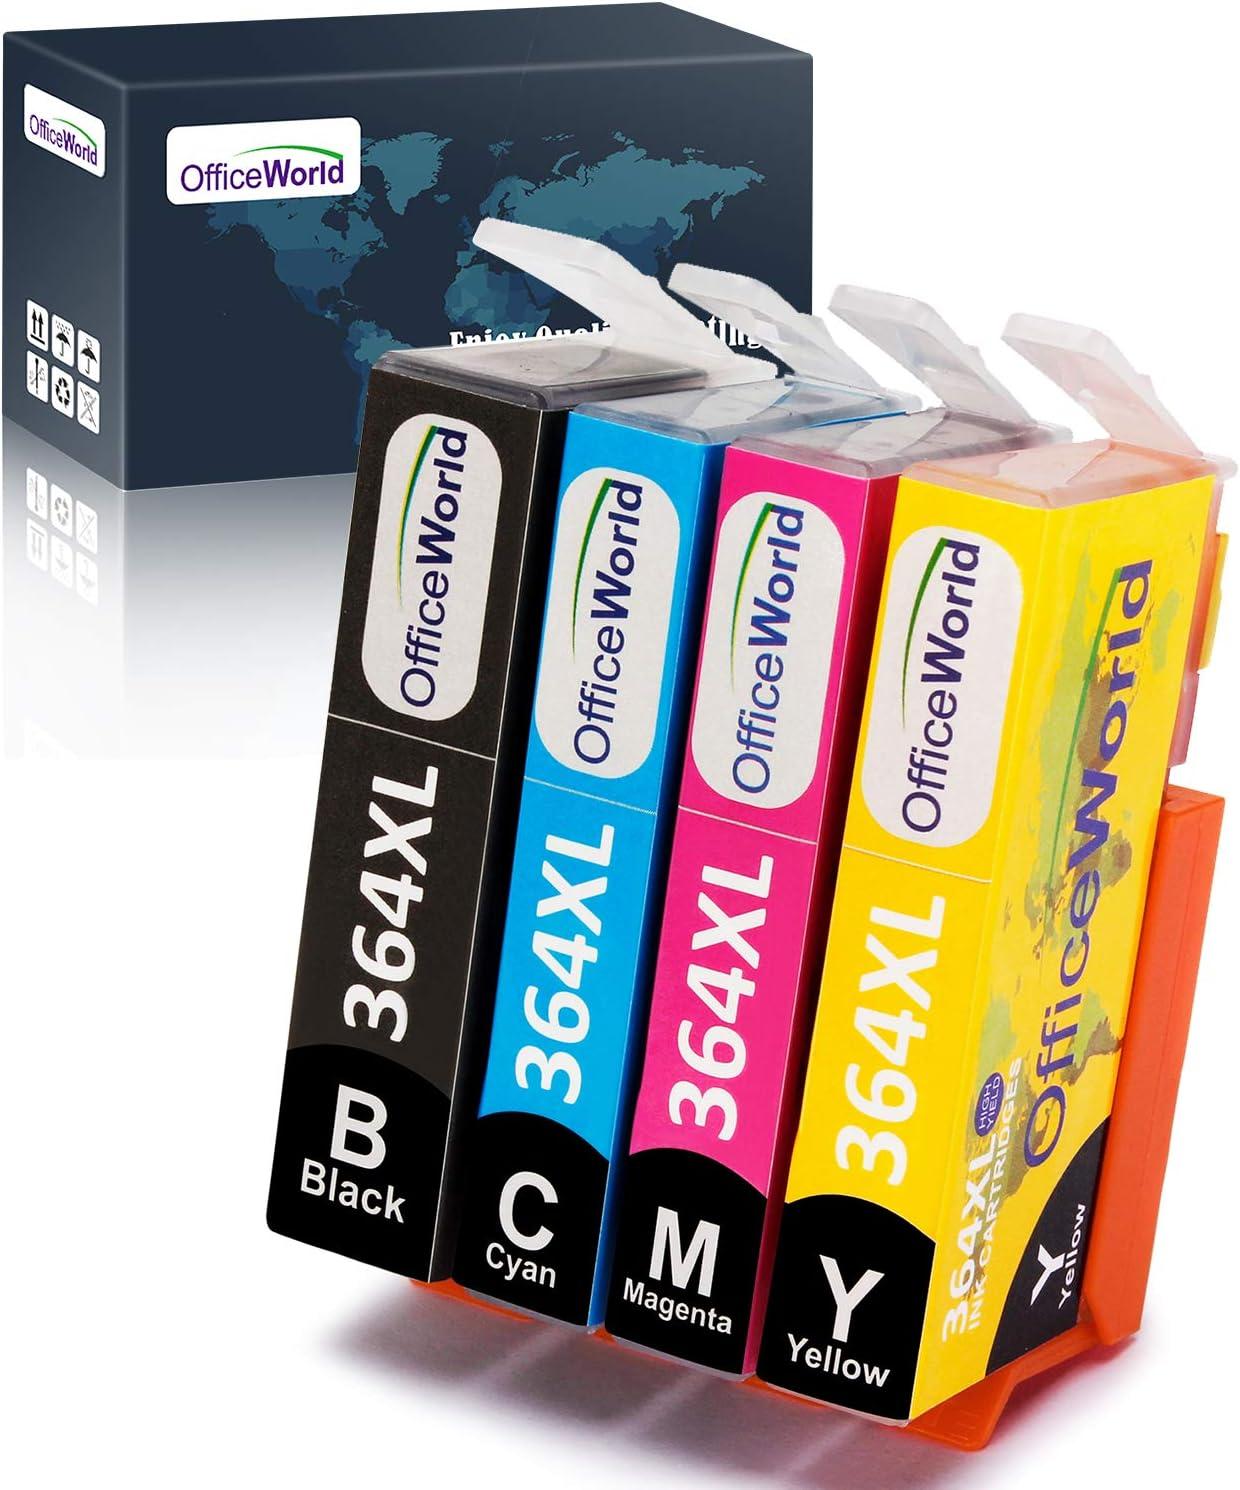 OfficeWorld Reemplazo para HP 364 364XL cartuchos de tinta Compatible para HP Photosmart 5520 7510 5510 7520 5522, HP Officejet 4620, HP Deskjet 3520 3070A (1 Negro, 1 Cian, 1 Magenta, 1 Amarillo)